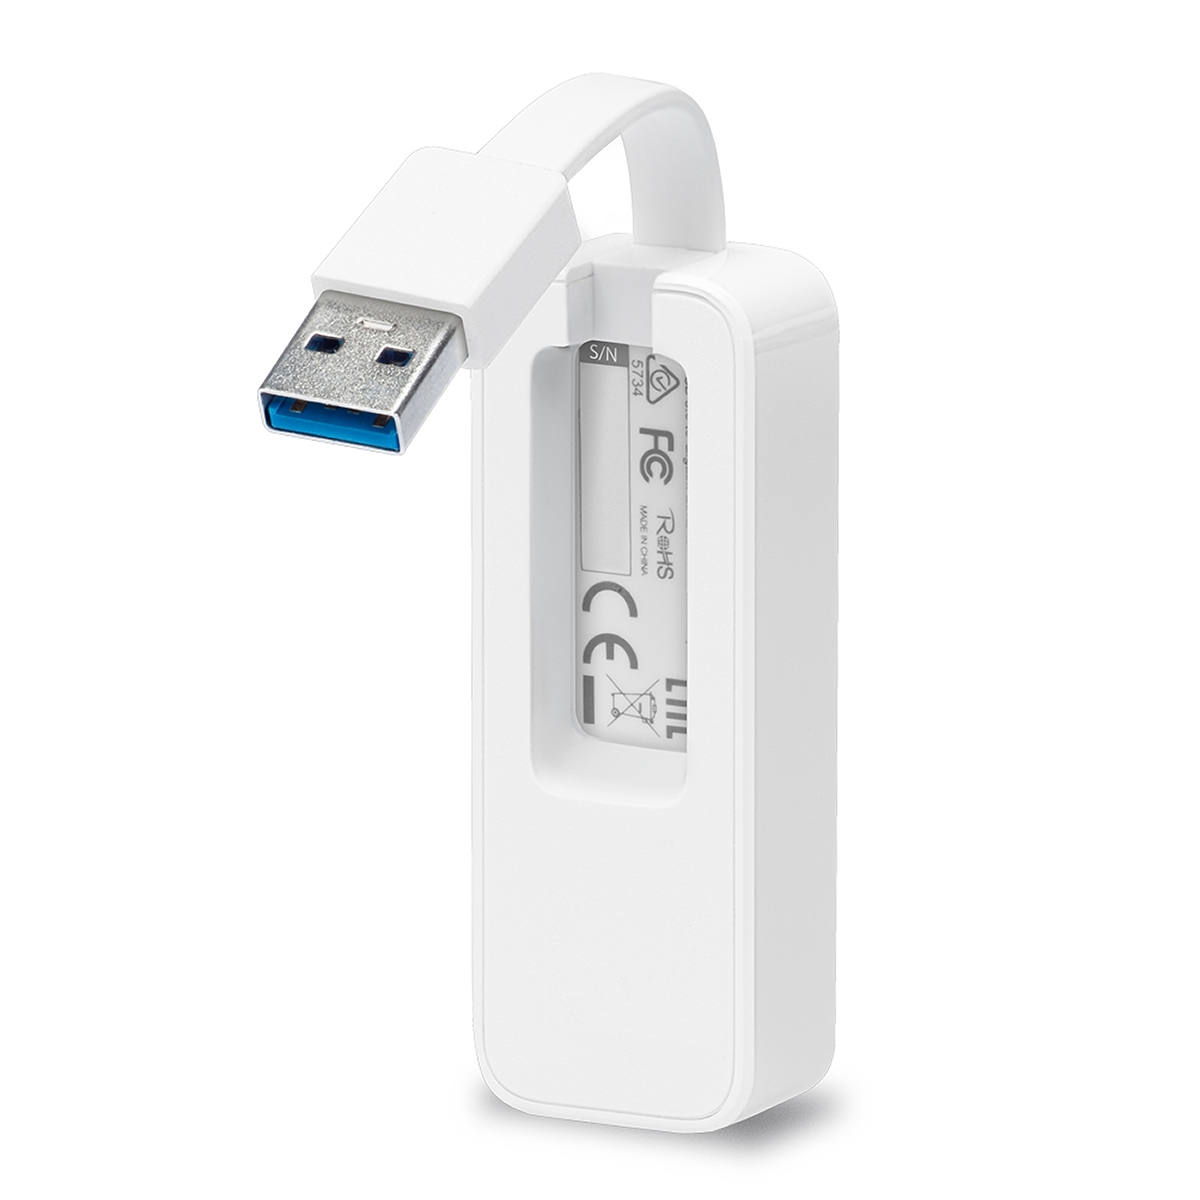 Adaptador USB 3.0 para Rede Gigabit RJ45 Ethernet TP-Link UE300